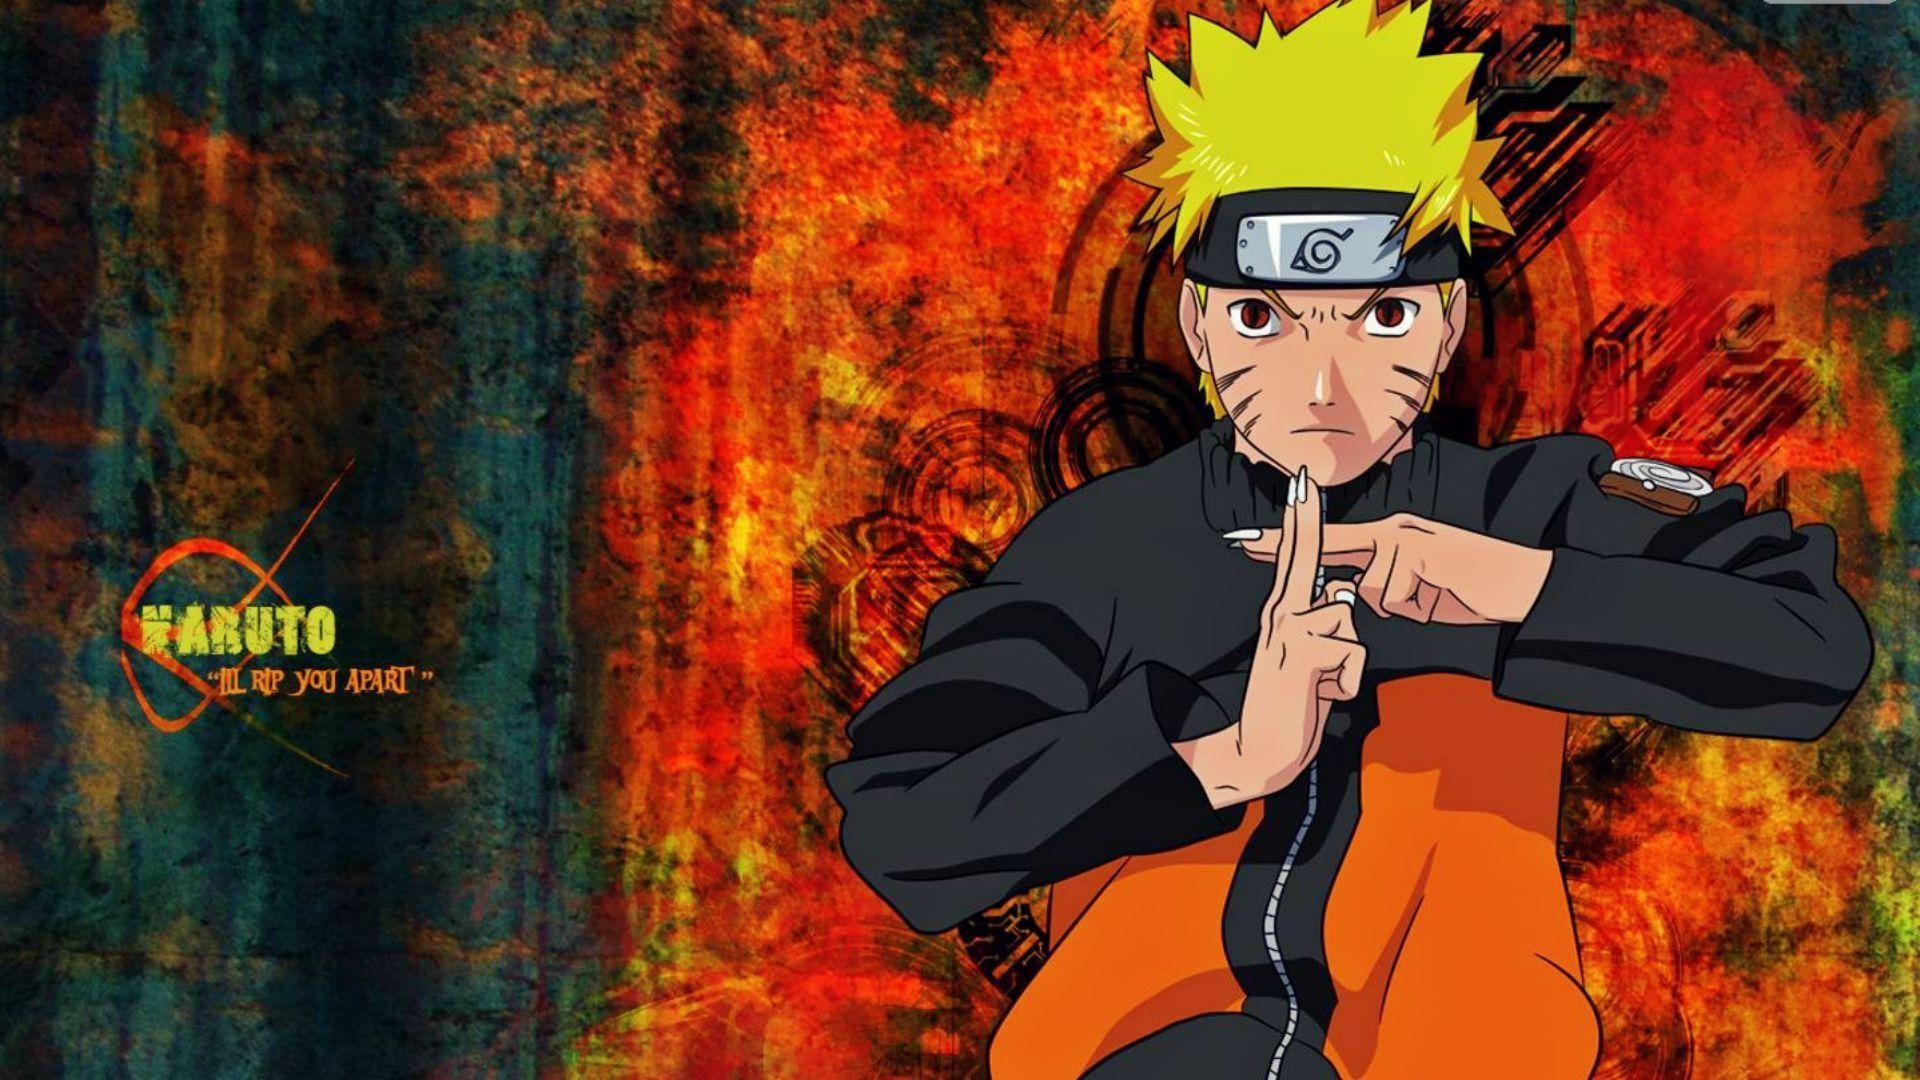 Naruto Wallpaper Hd, New Wallpaper